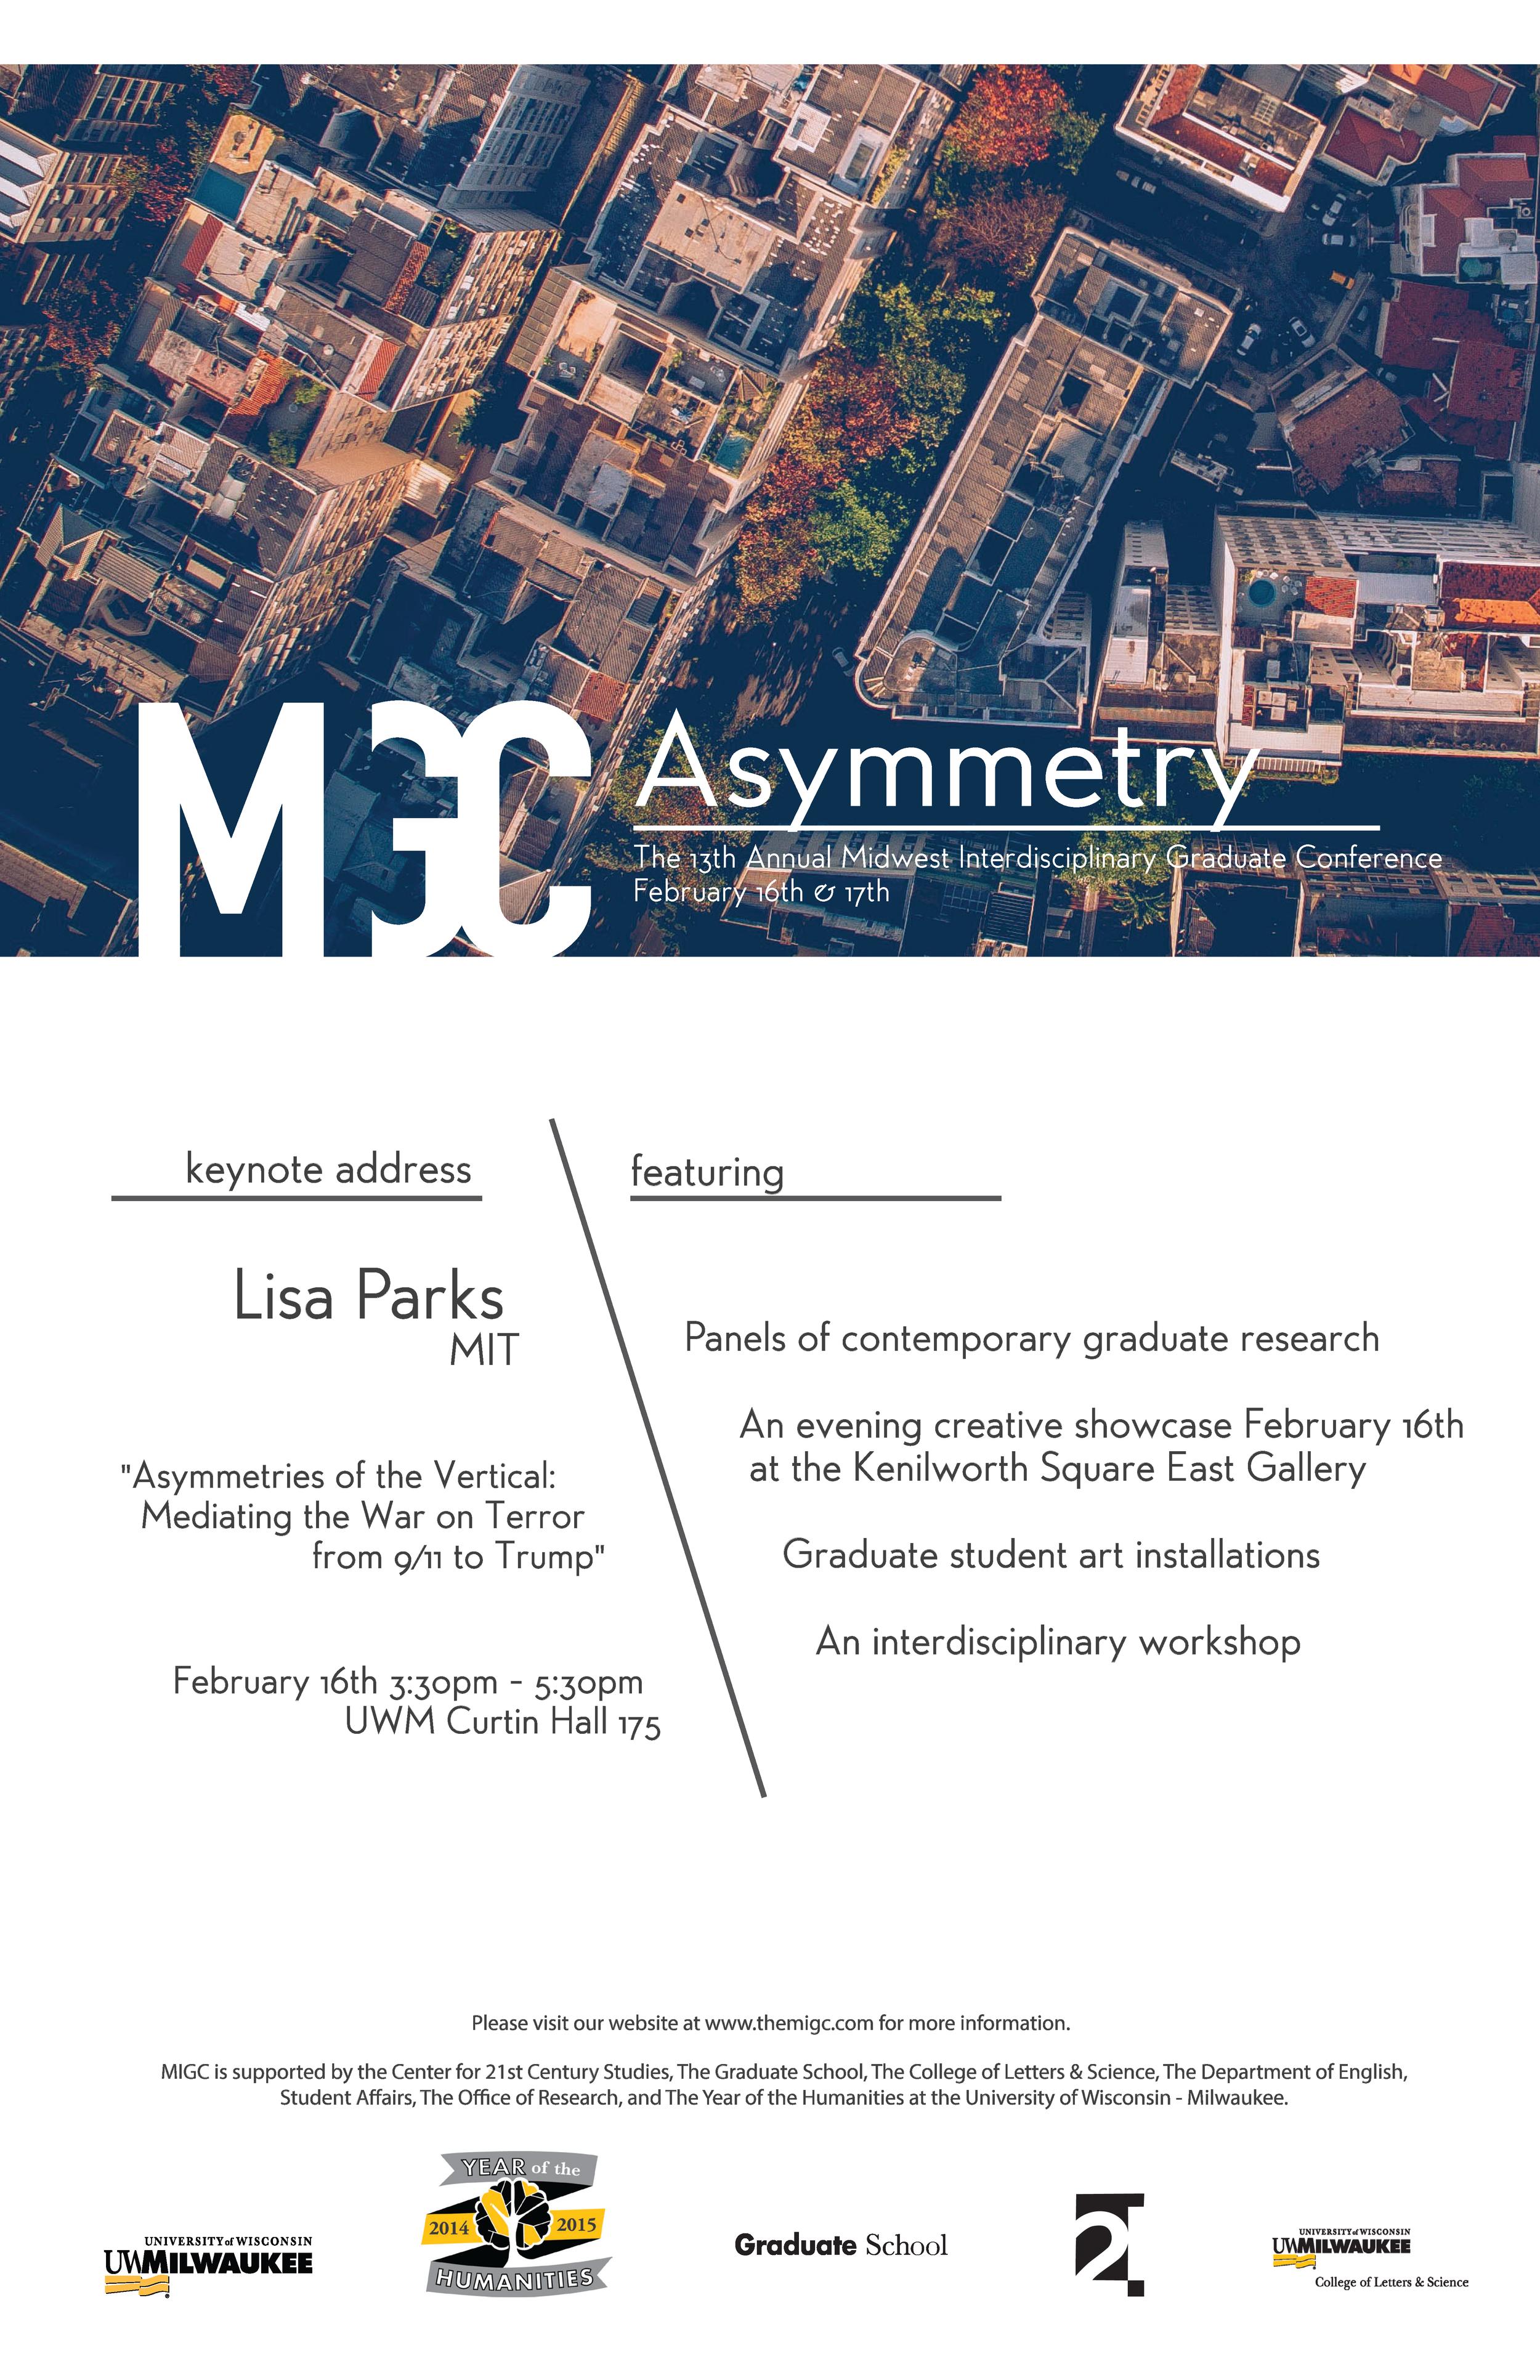 MIGC 2018: Asymmetry